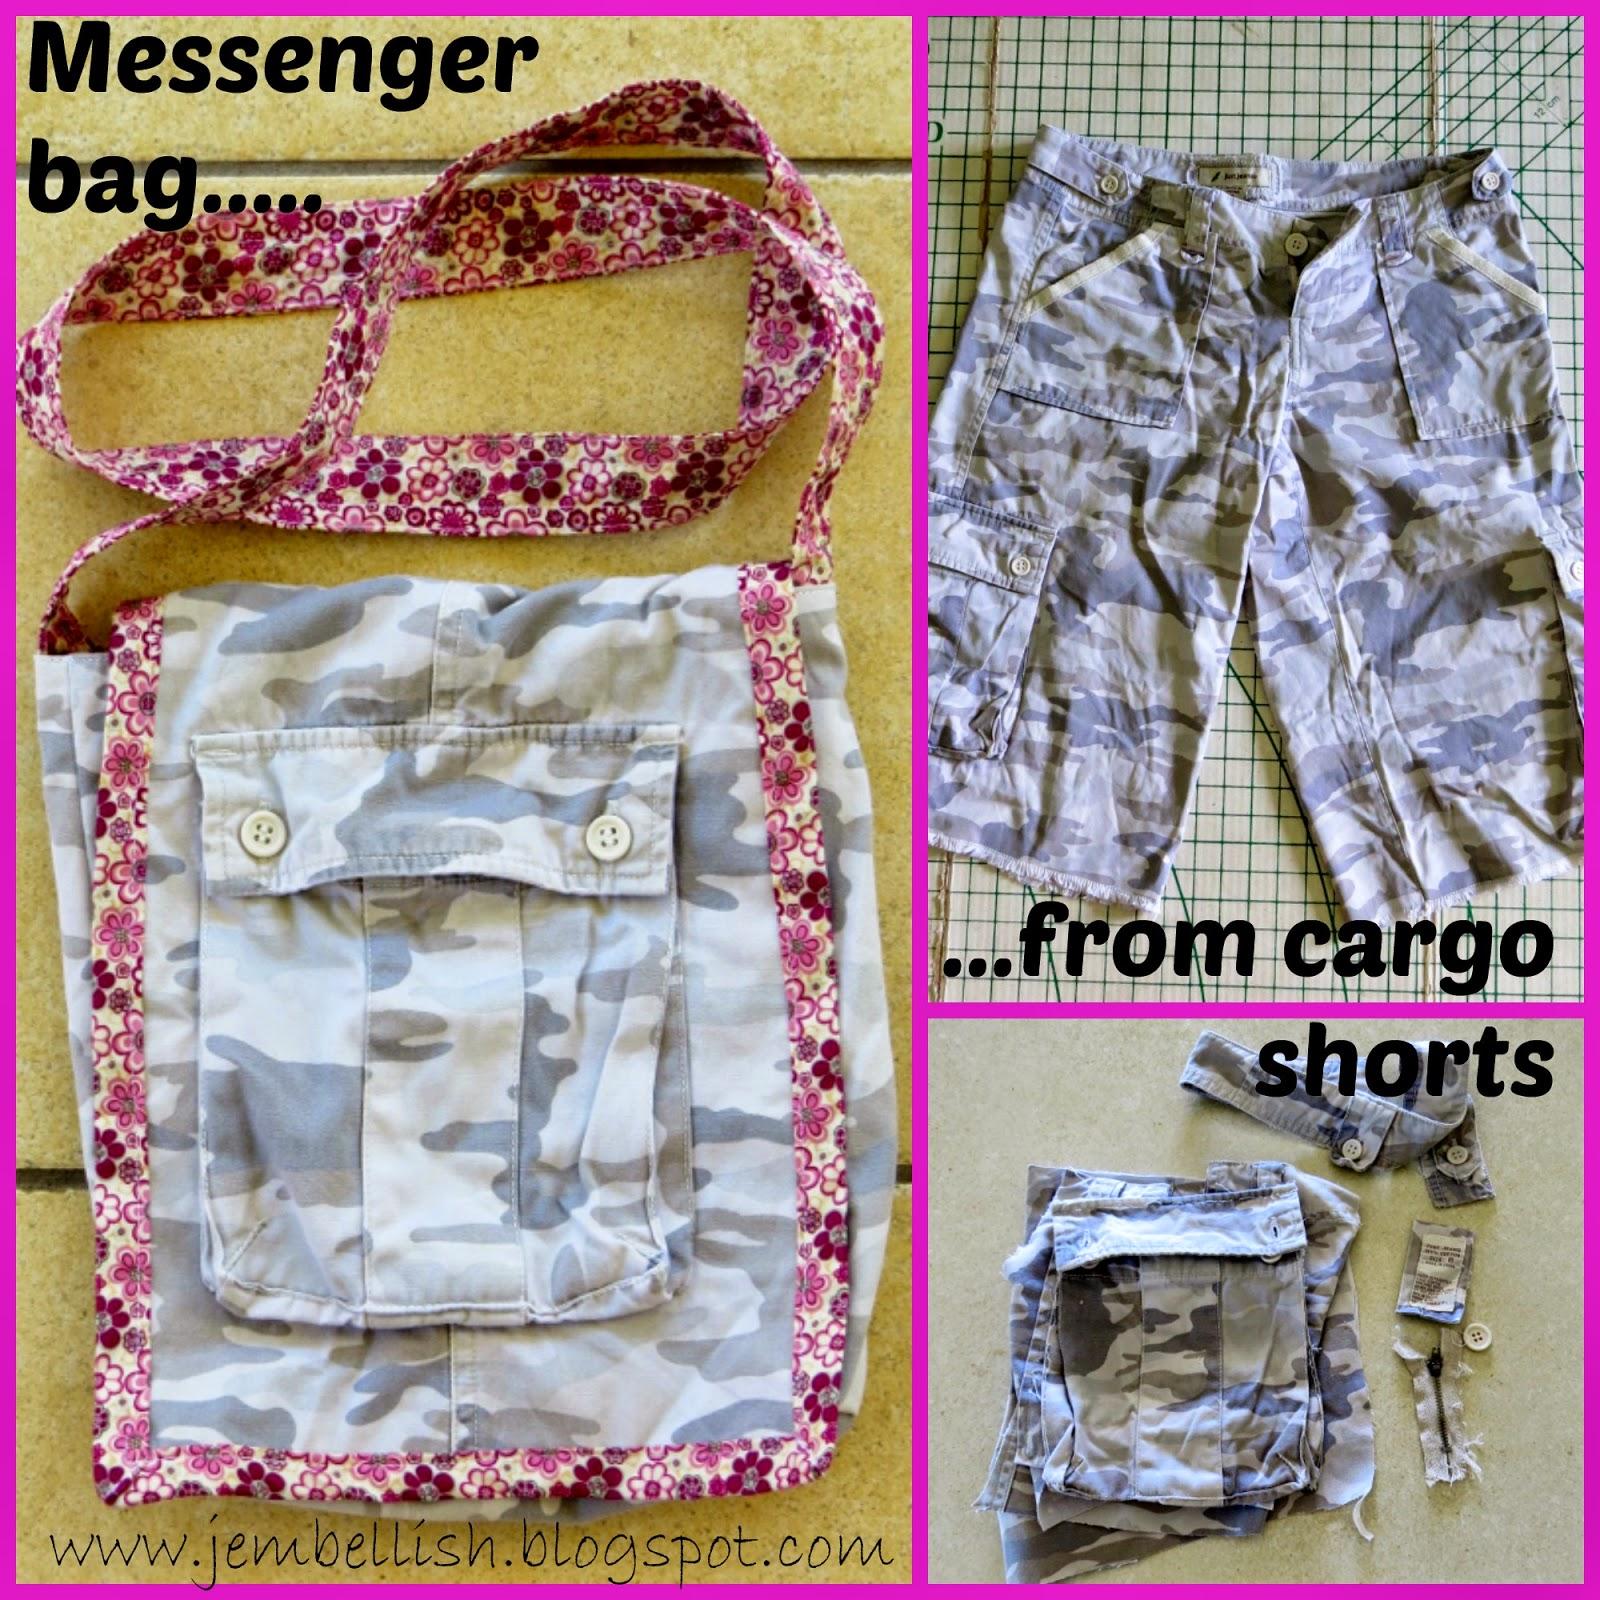 Messenger Bag from Cargo Shorts